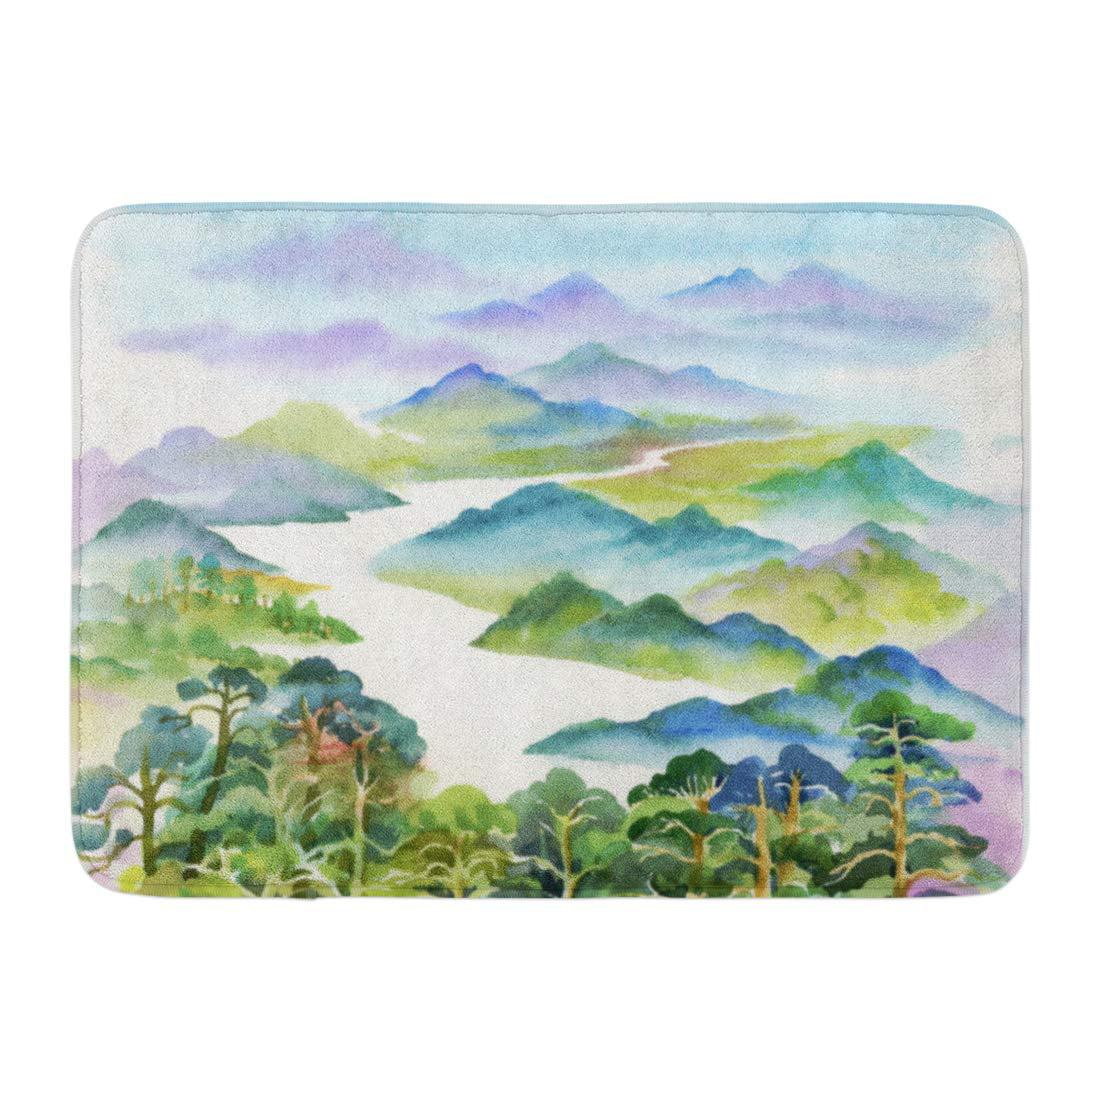 GODPOK Hills Green Painting Watercolor Summer River